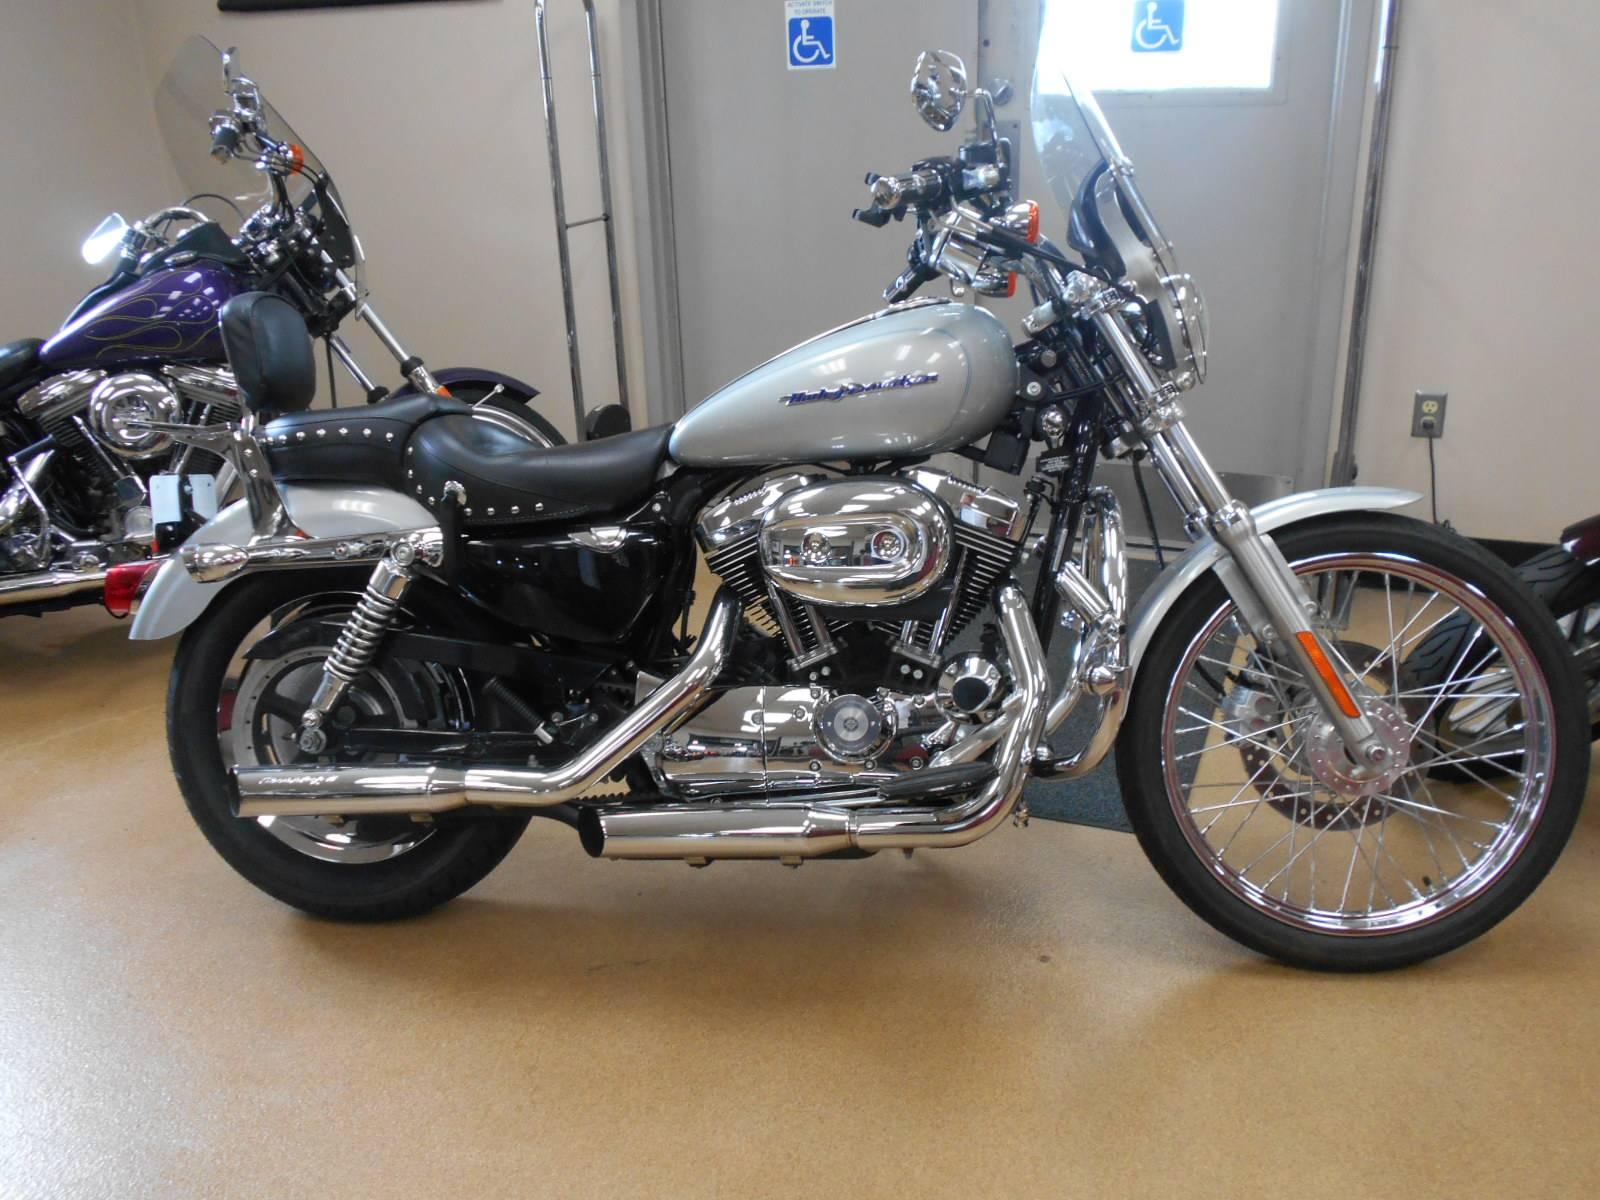 2005 Harley-Davidson Sportster® XL 1200 Custom in Mauston, Wisconsin